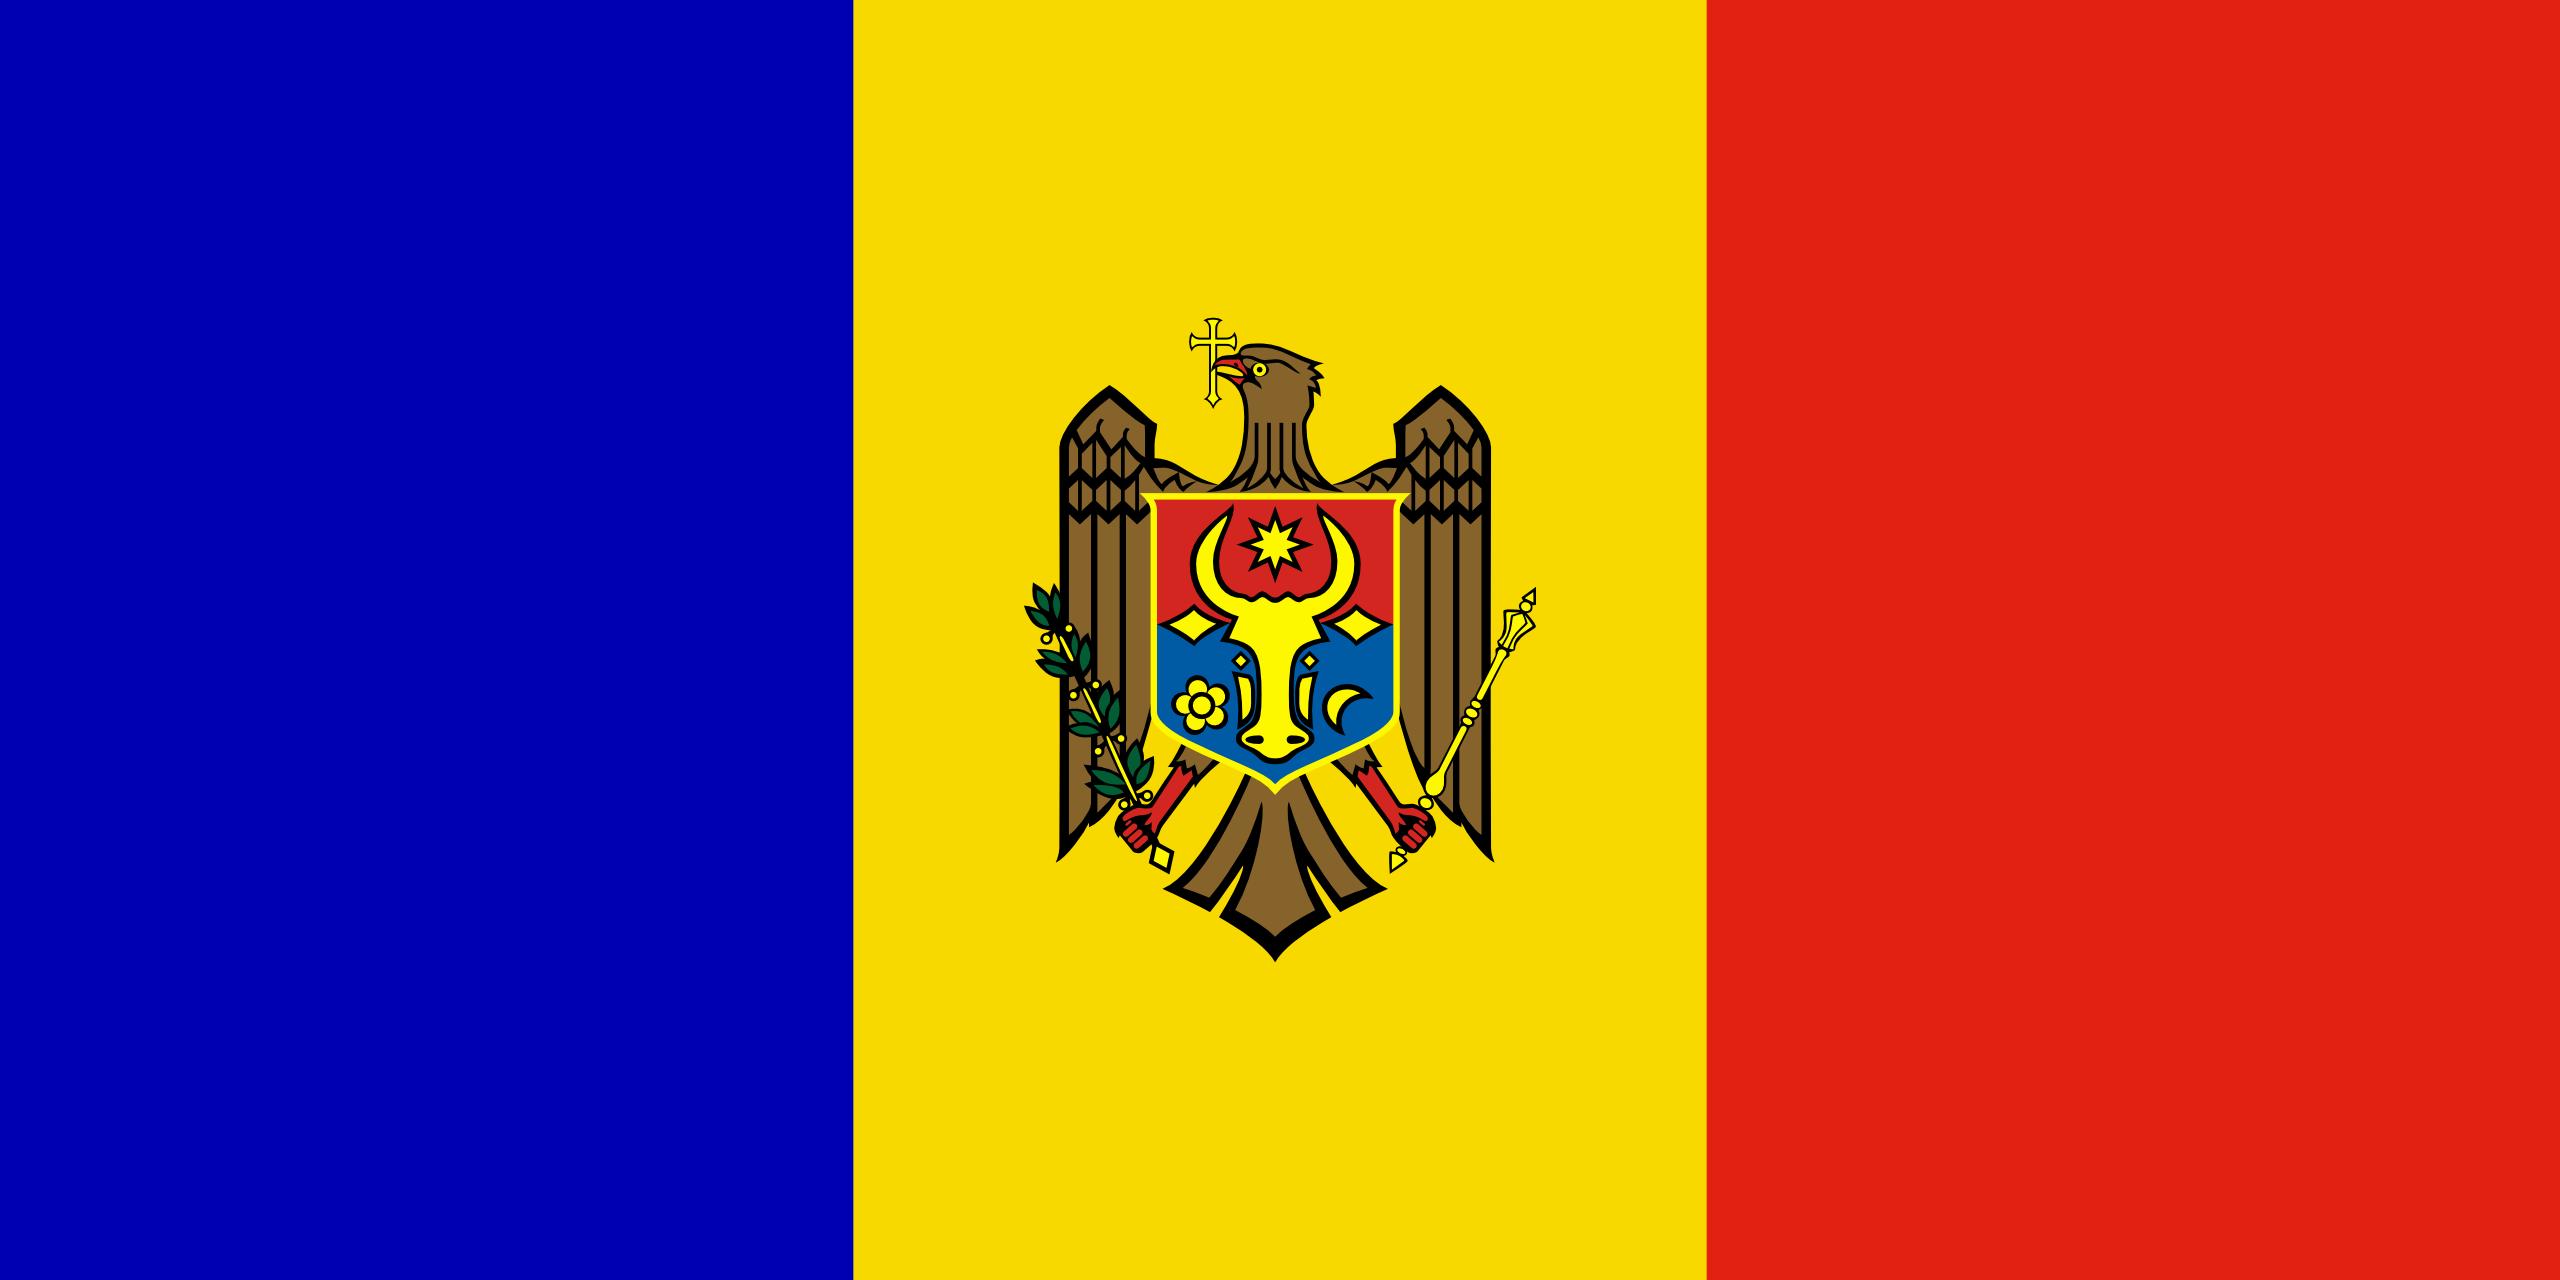 moldavia, देश, emblema, लोग�प्रतीकbolo - HD वॉलपेपर - प्रोफेसर-falken.com